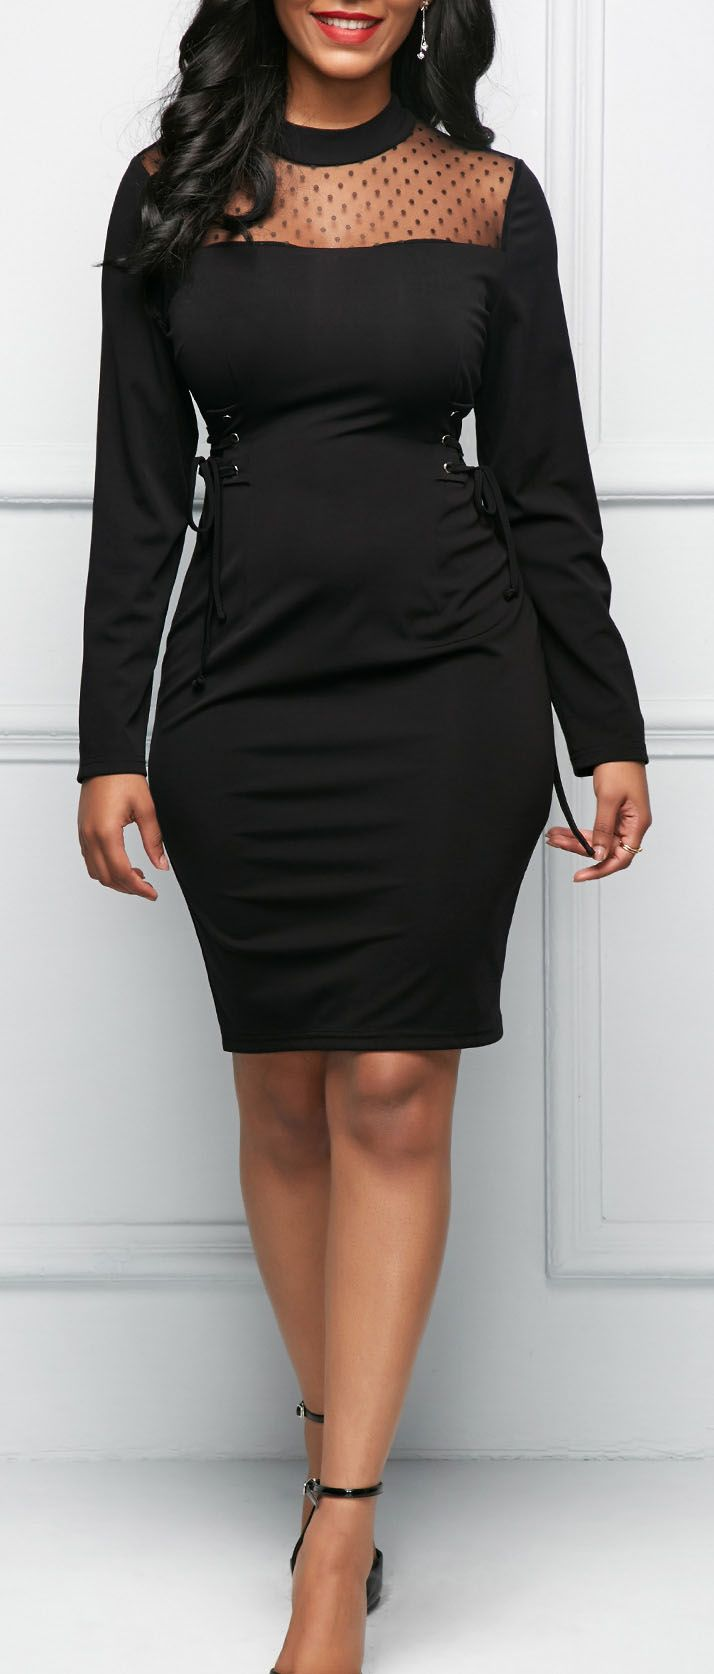 Lace Up Side Back Slit Long Sleeve Dress